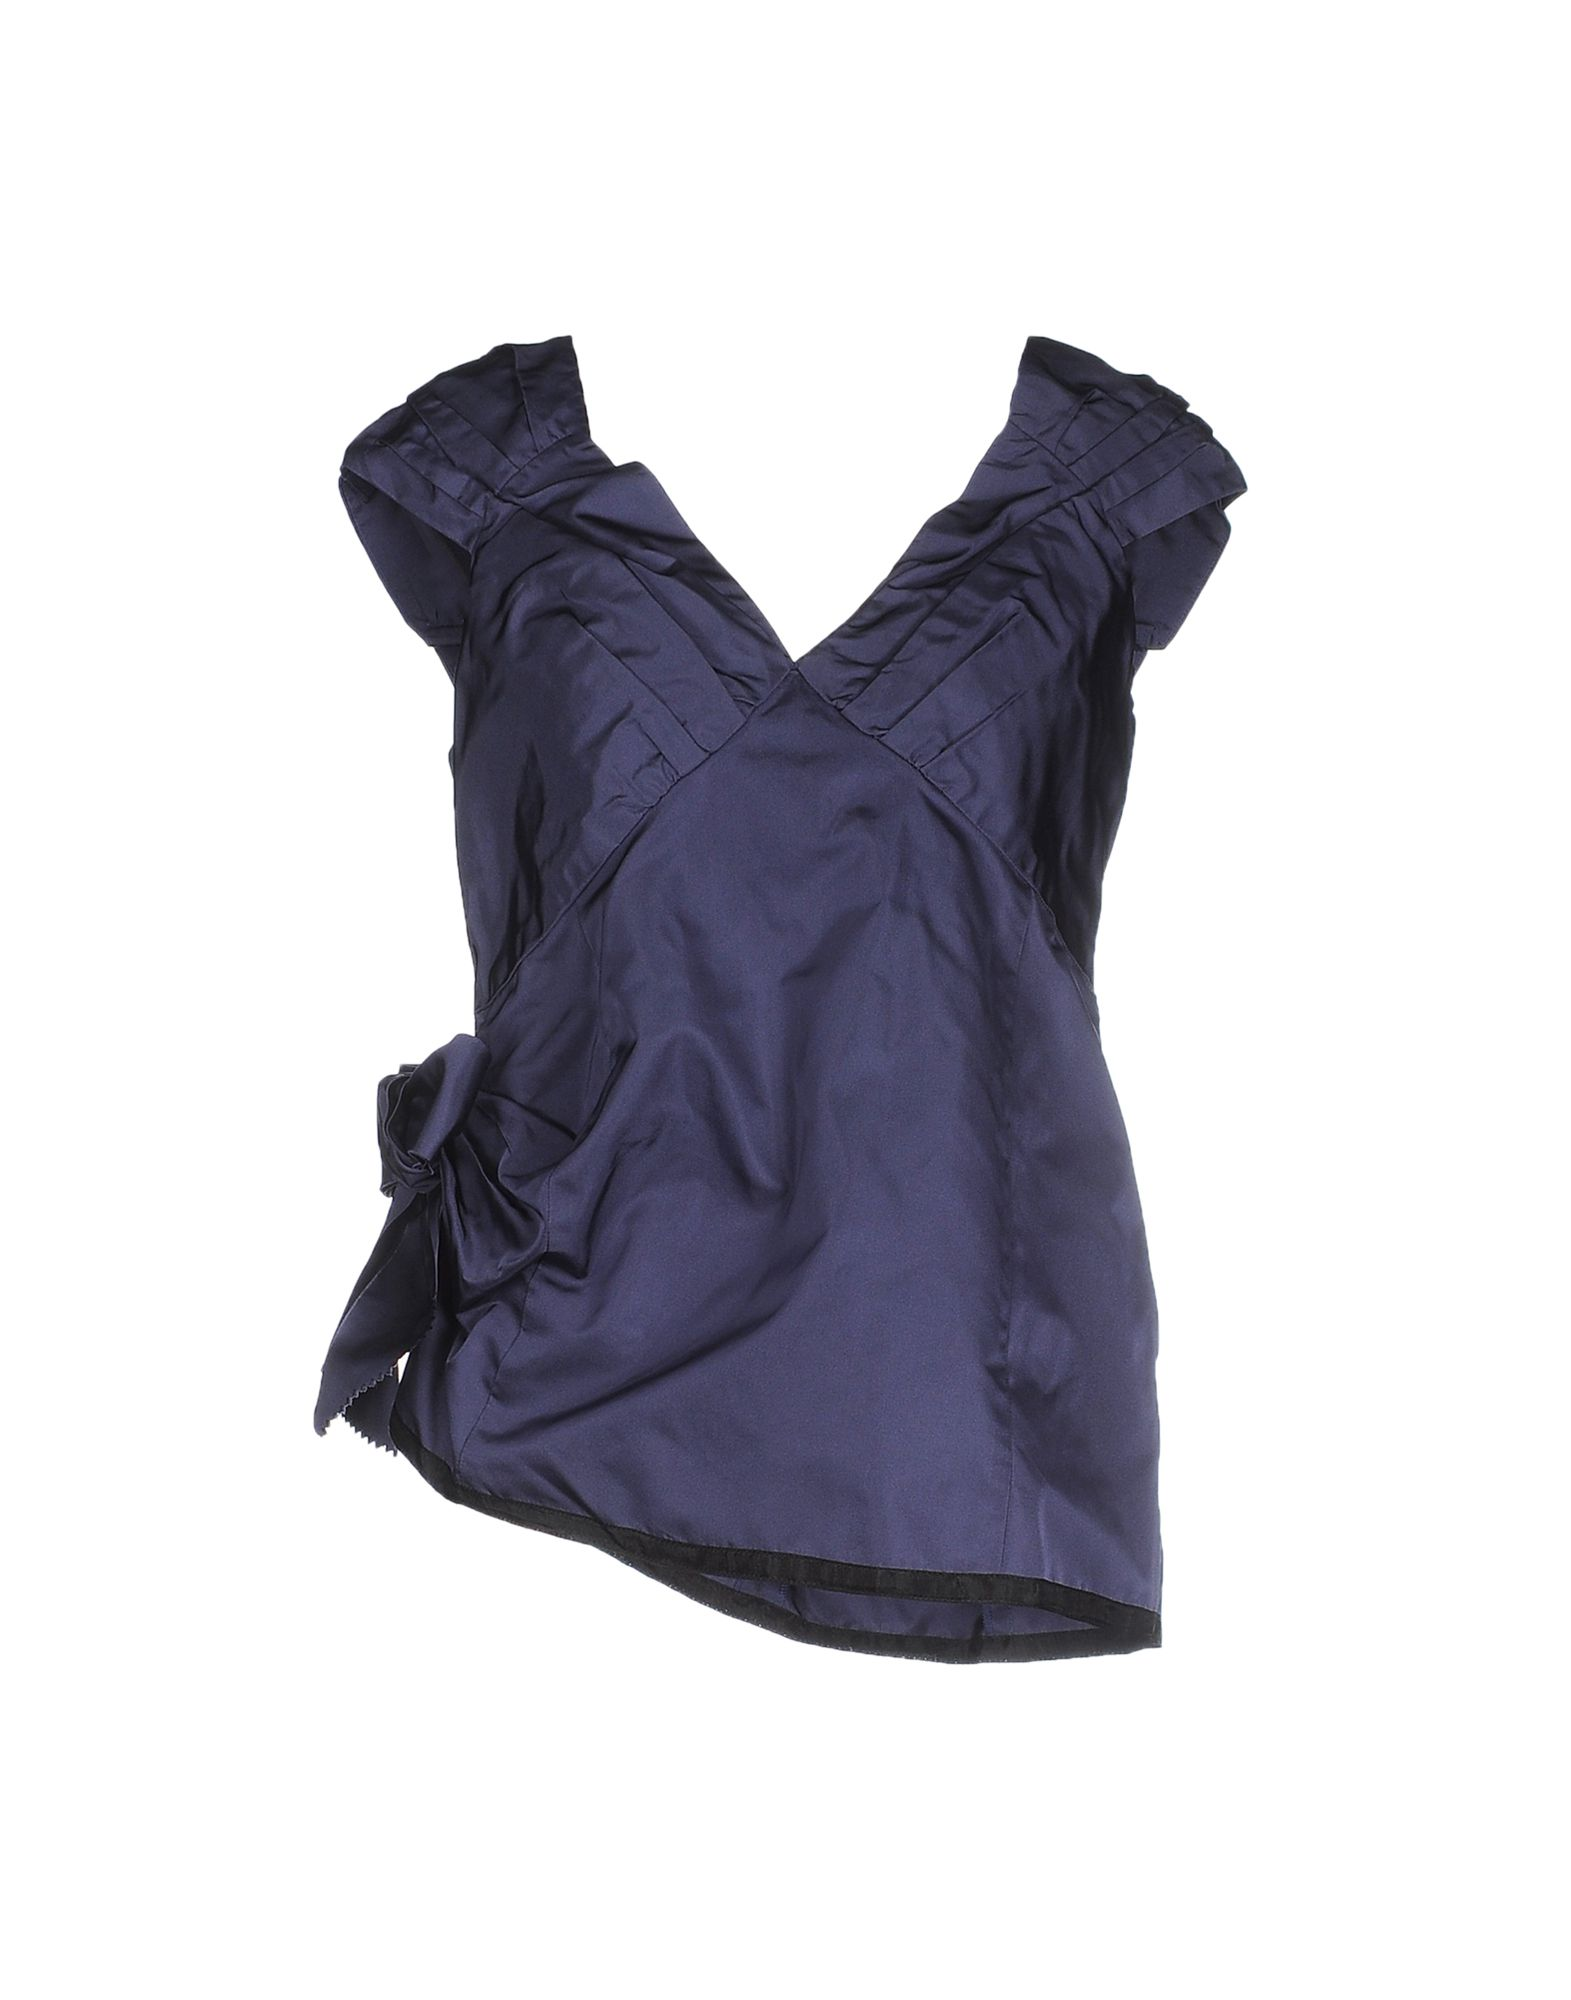 marc jacobs female marc jacobs blouses